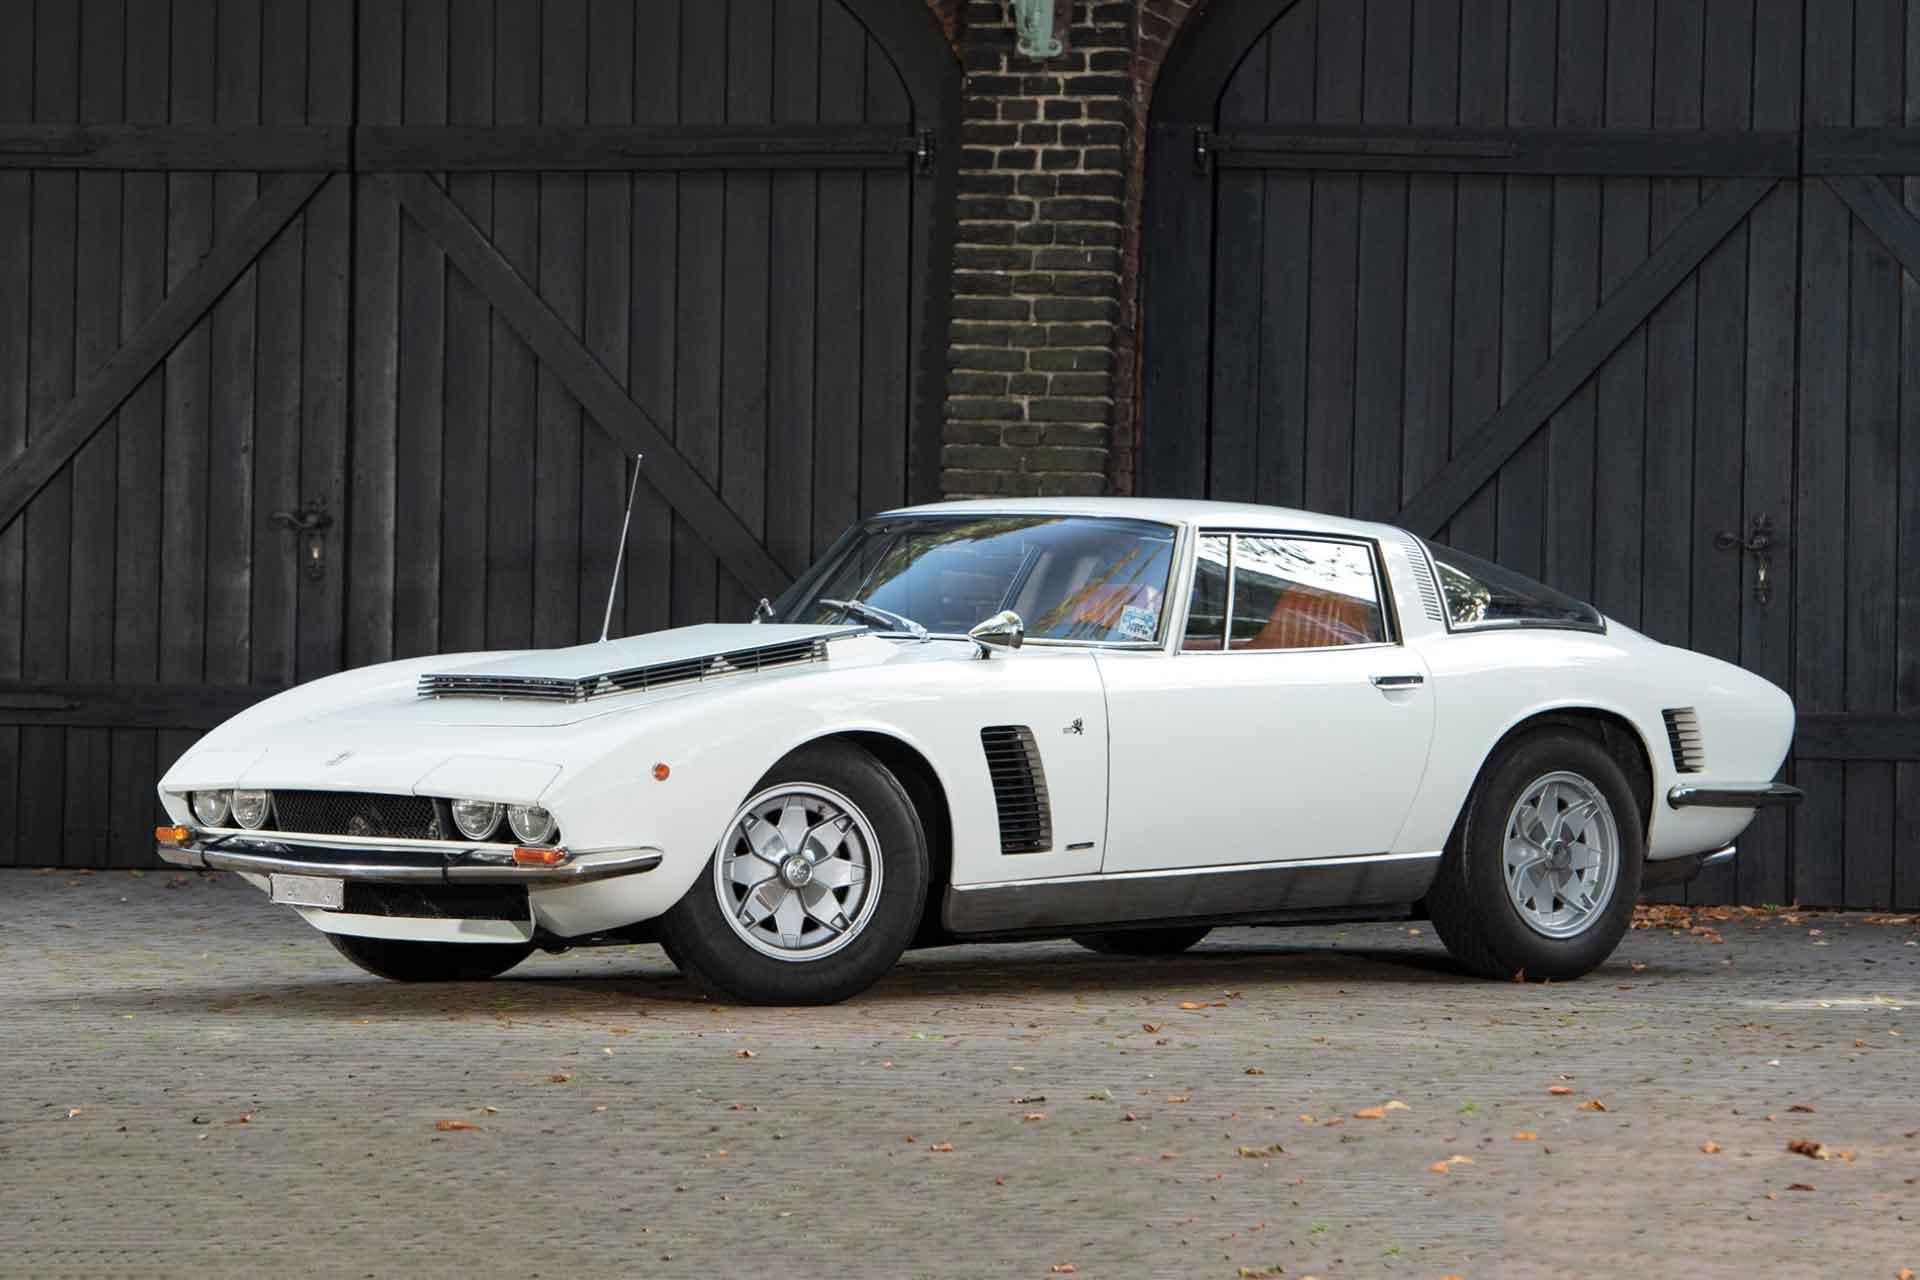 1973 Iso Grifo GL Series II Coupe